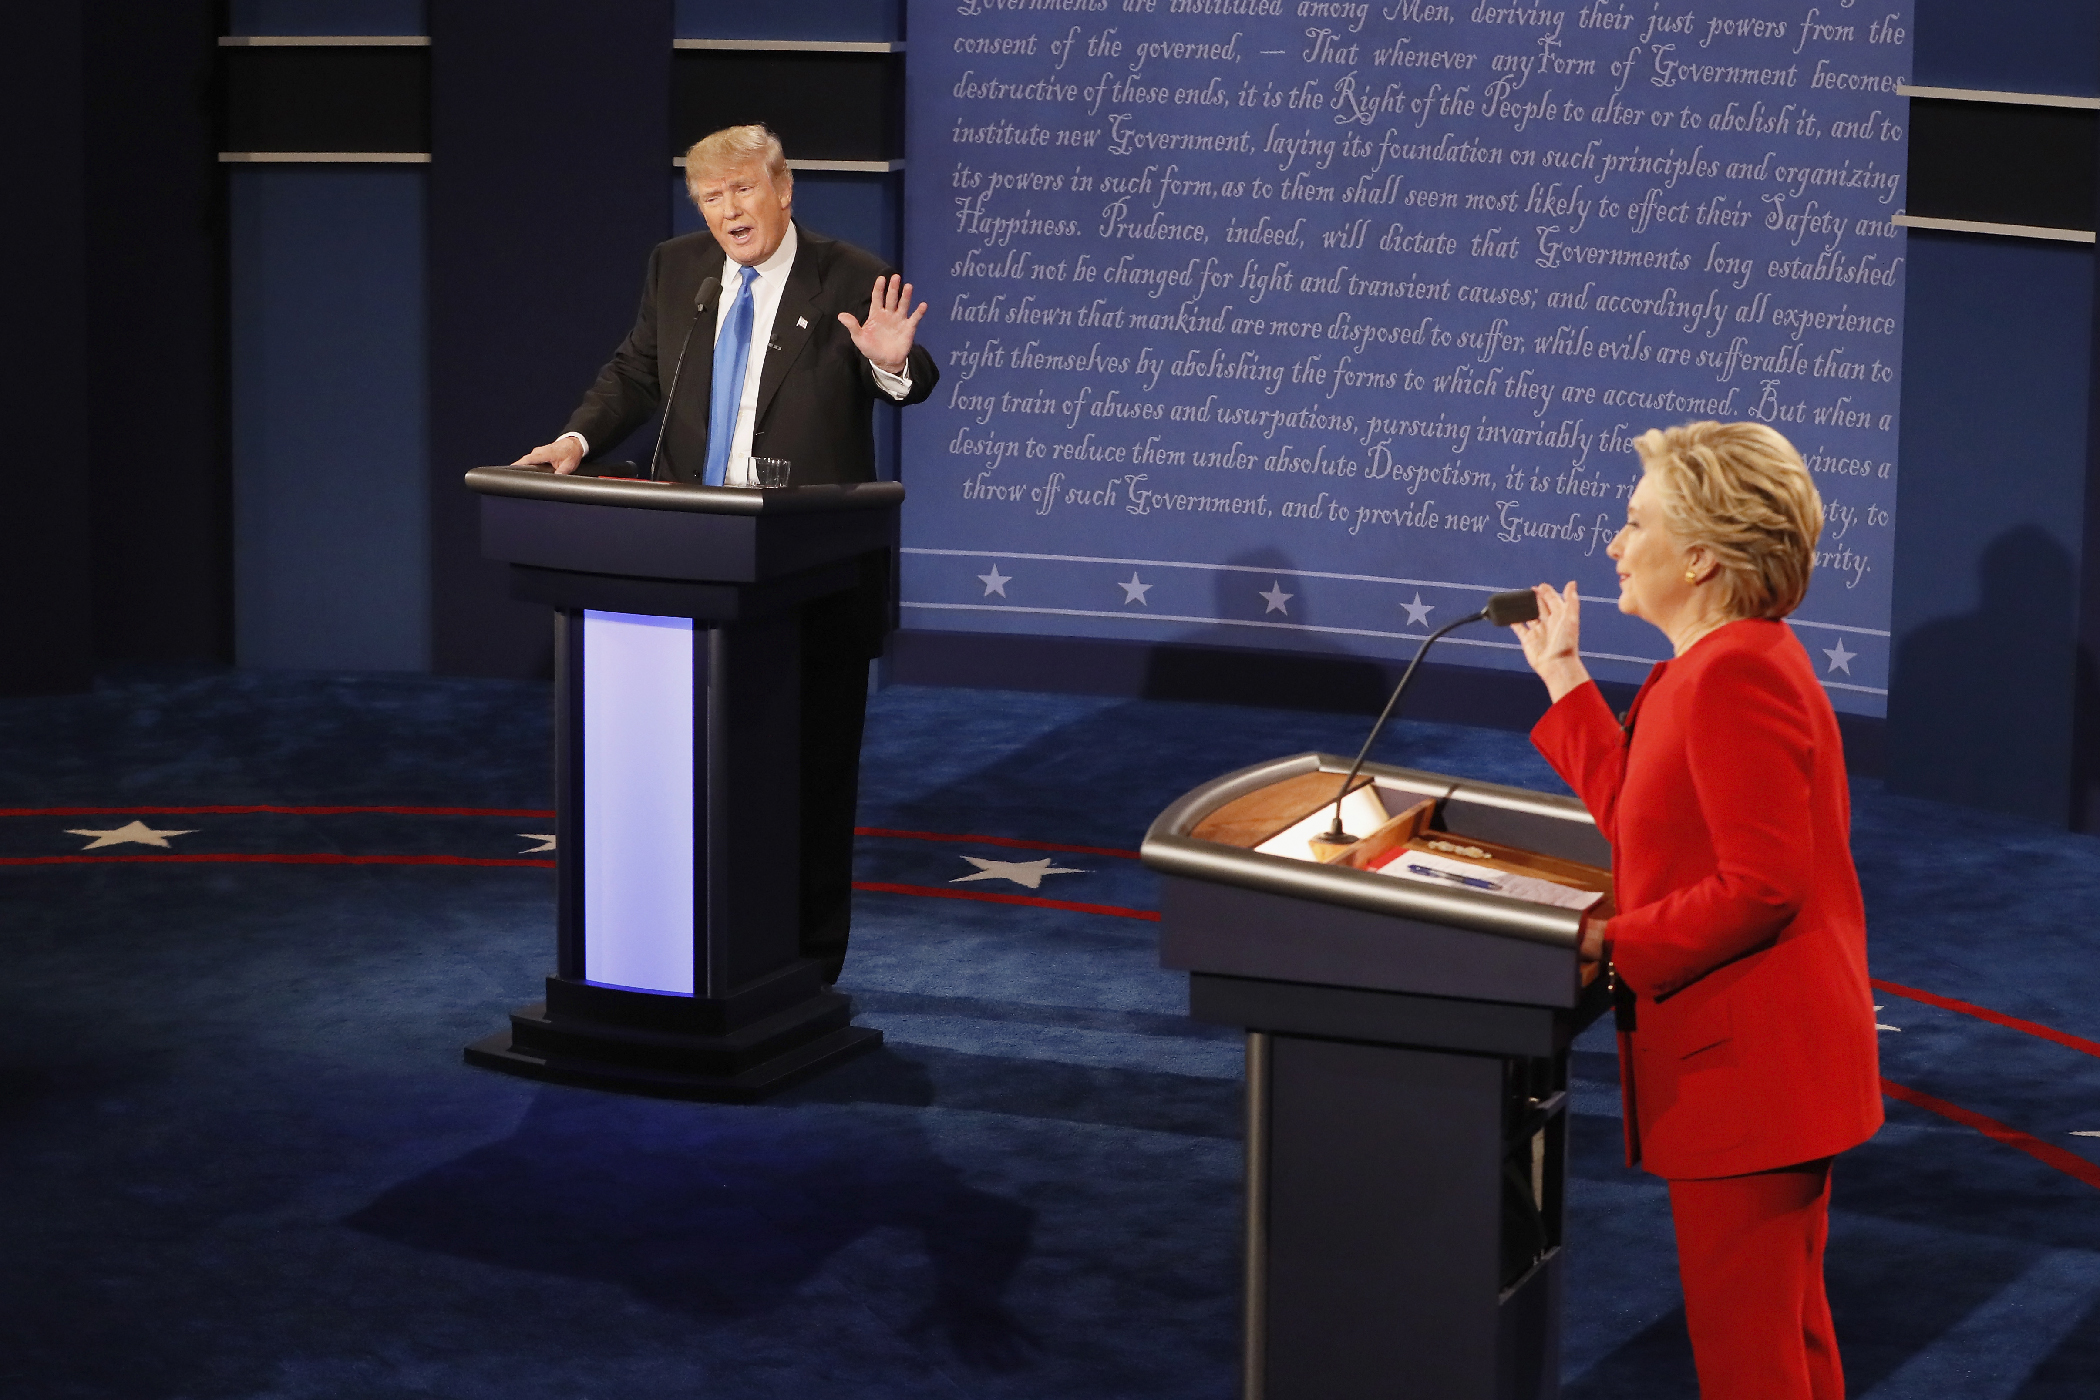 Trump vs. Clinton on Jobs, Trade, and Taxes